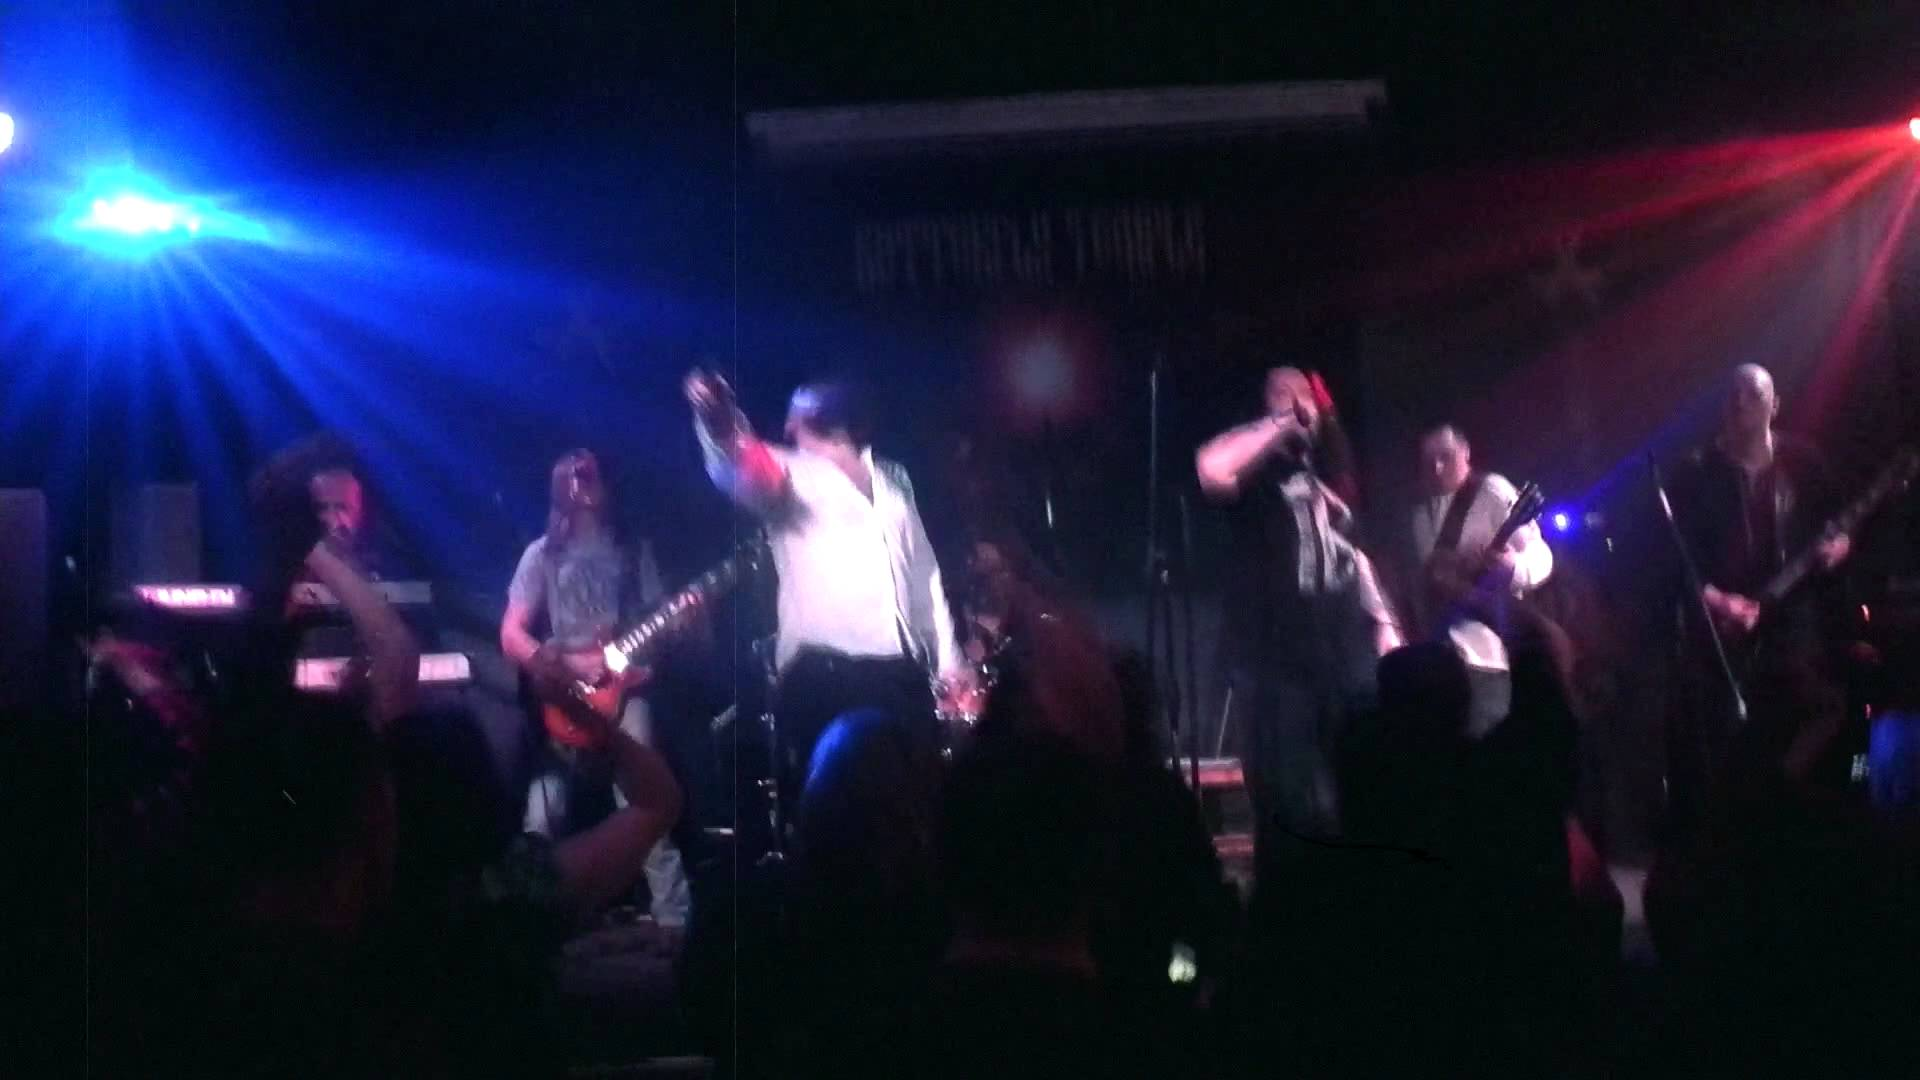 BUTTERFLY TEMPLE - Смерть дана одна на всех feat. А. Салтыков (live in Smolensk, 2015 02 23)